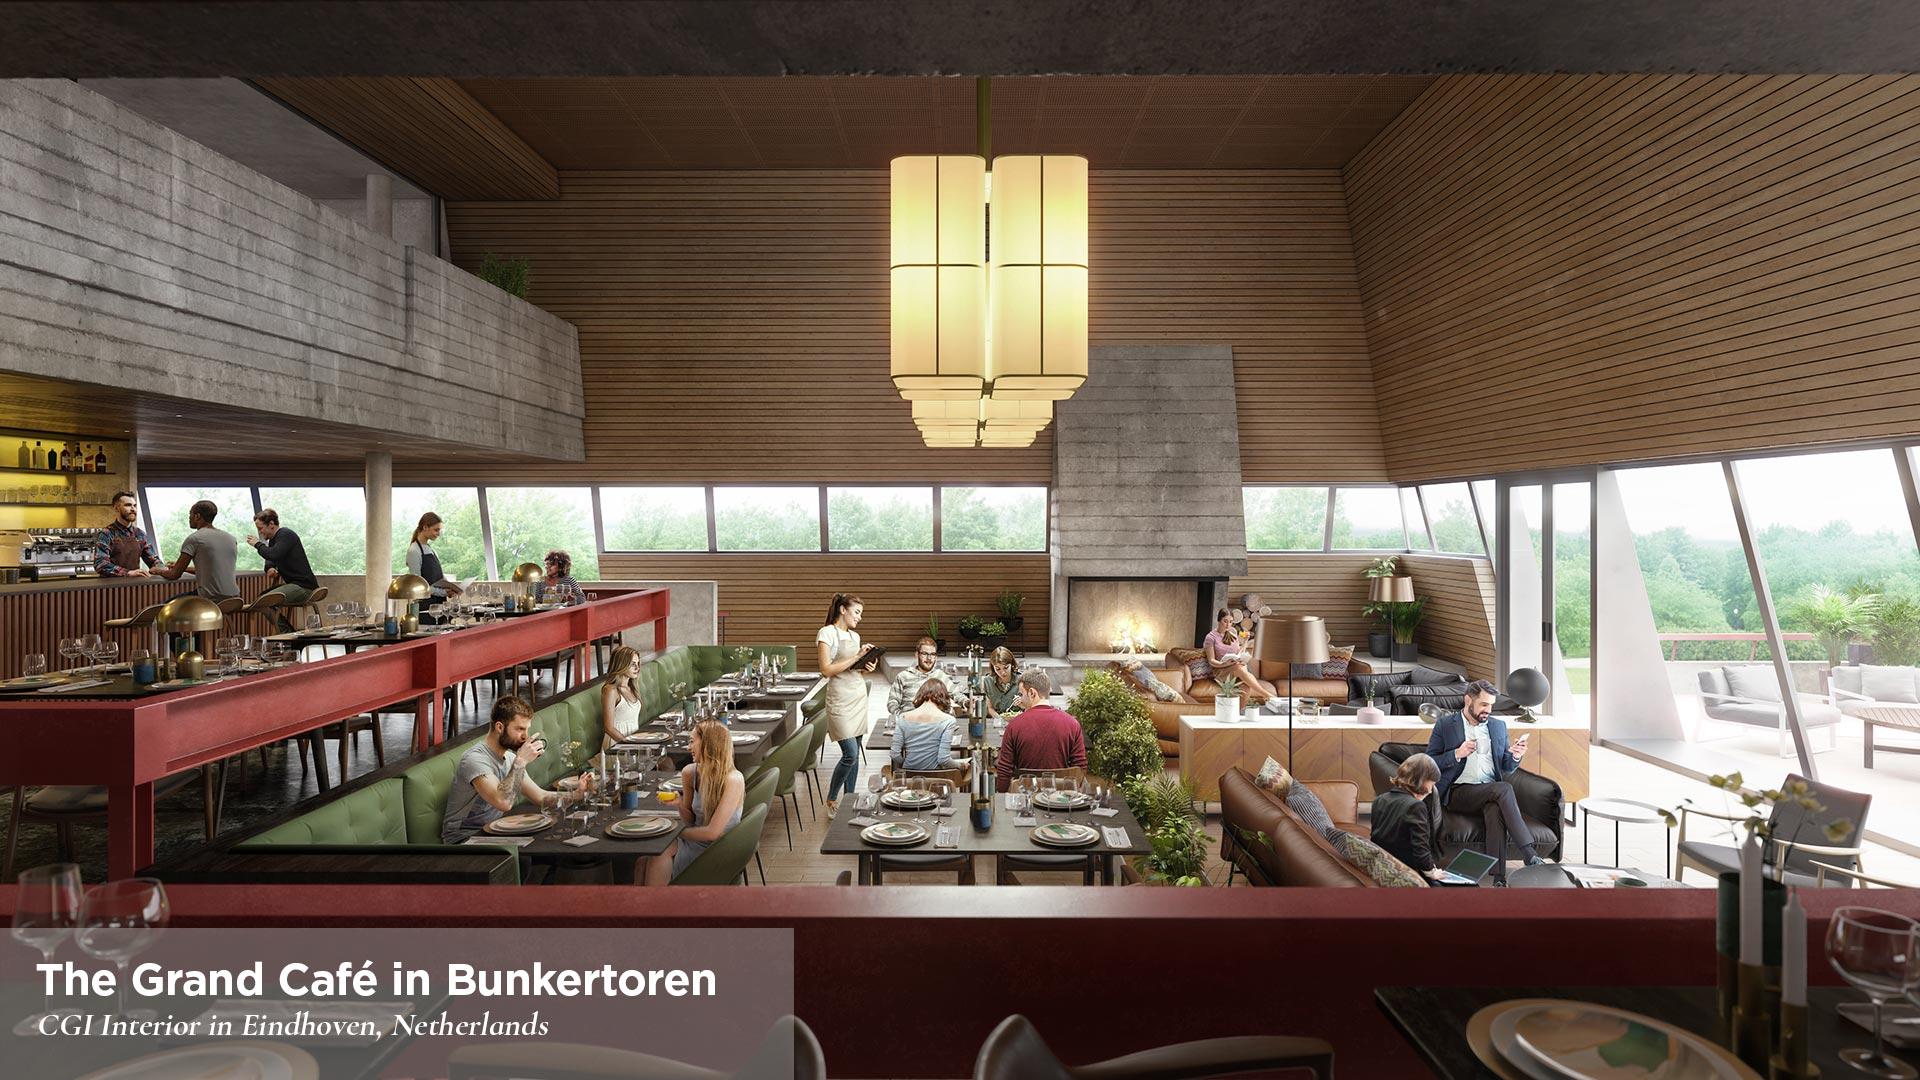 cgi-grand-cafe-interior-bunkertoren-powerhouse-company-eindhoven-copyright-kaiserbold-com